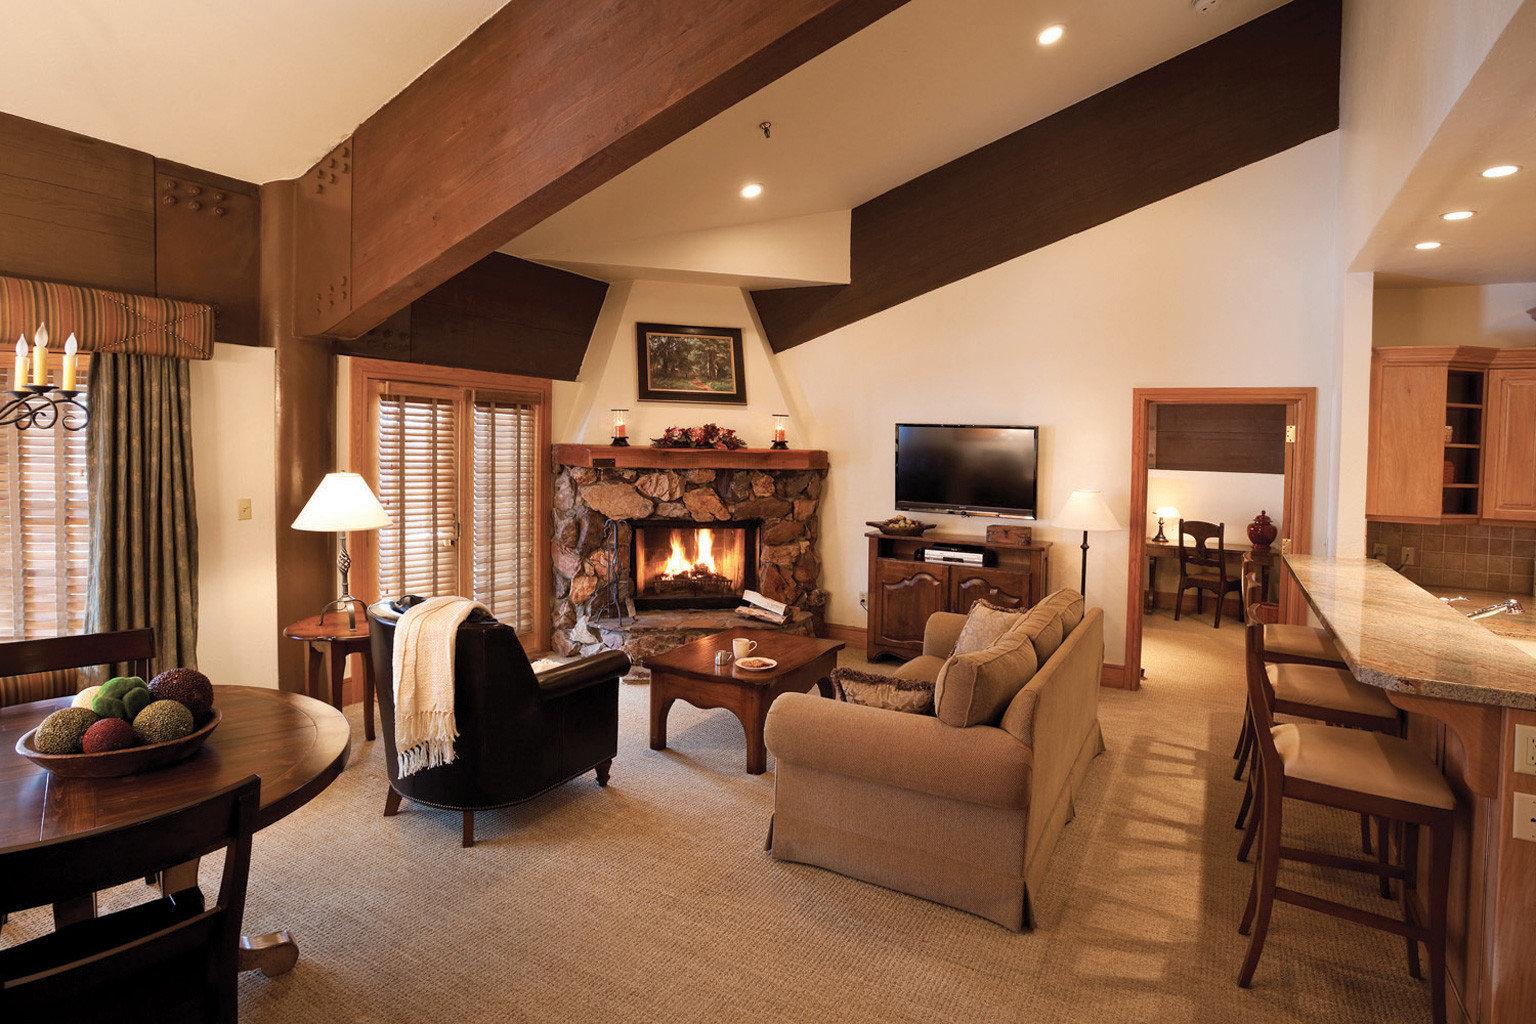 Fireplace Lodge Rustic Suite property living room home hardwood recreation room cottage Villa mansion farmhouse